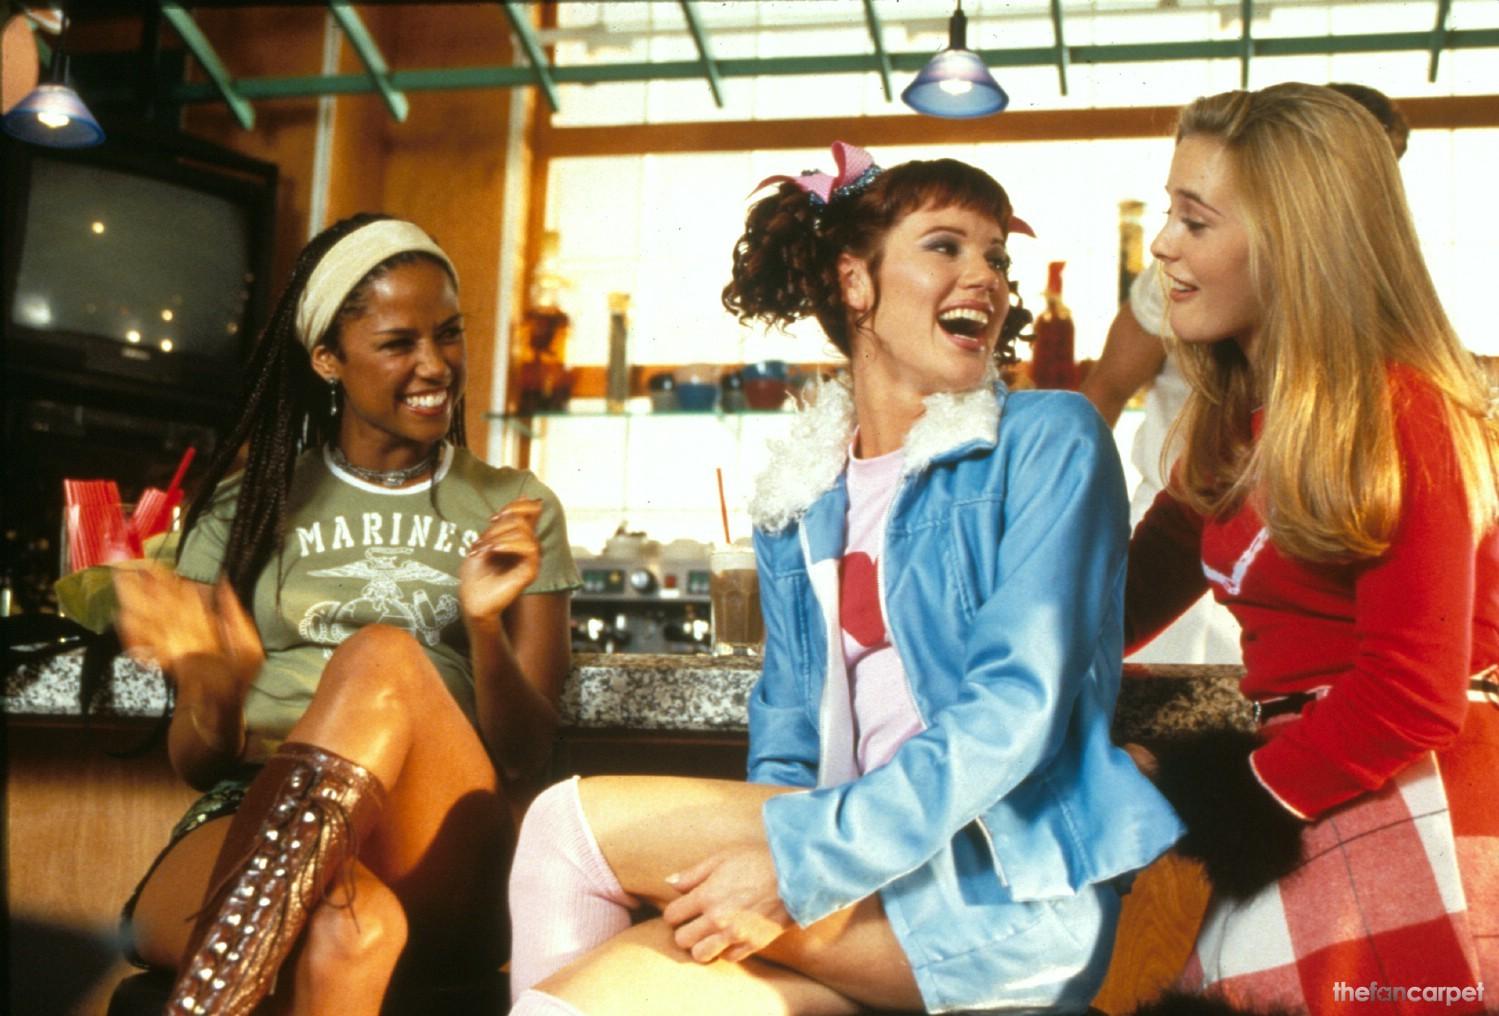 Alicia Silverstone,Elisa Donovan,Stacey Dash